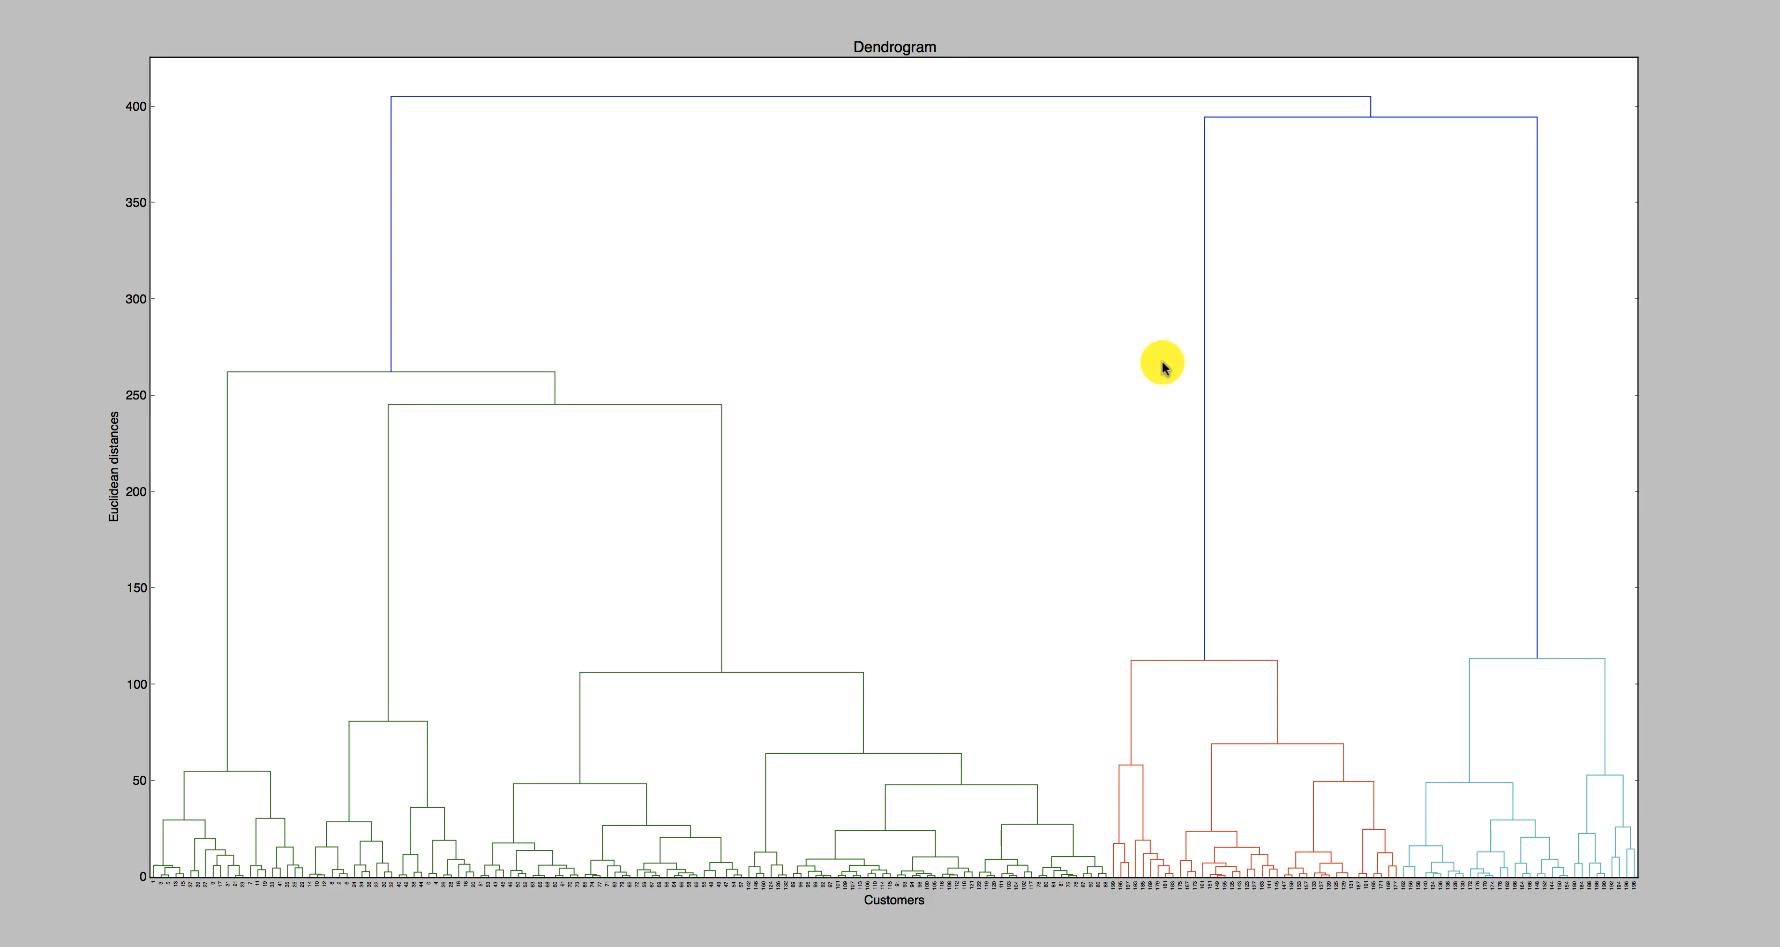 Maschinenlernen: Clusteranalyse mithilfe des Hierarchical Clustering - 5